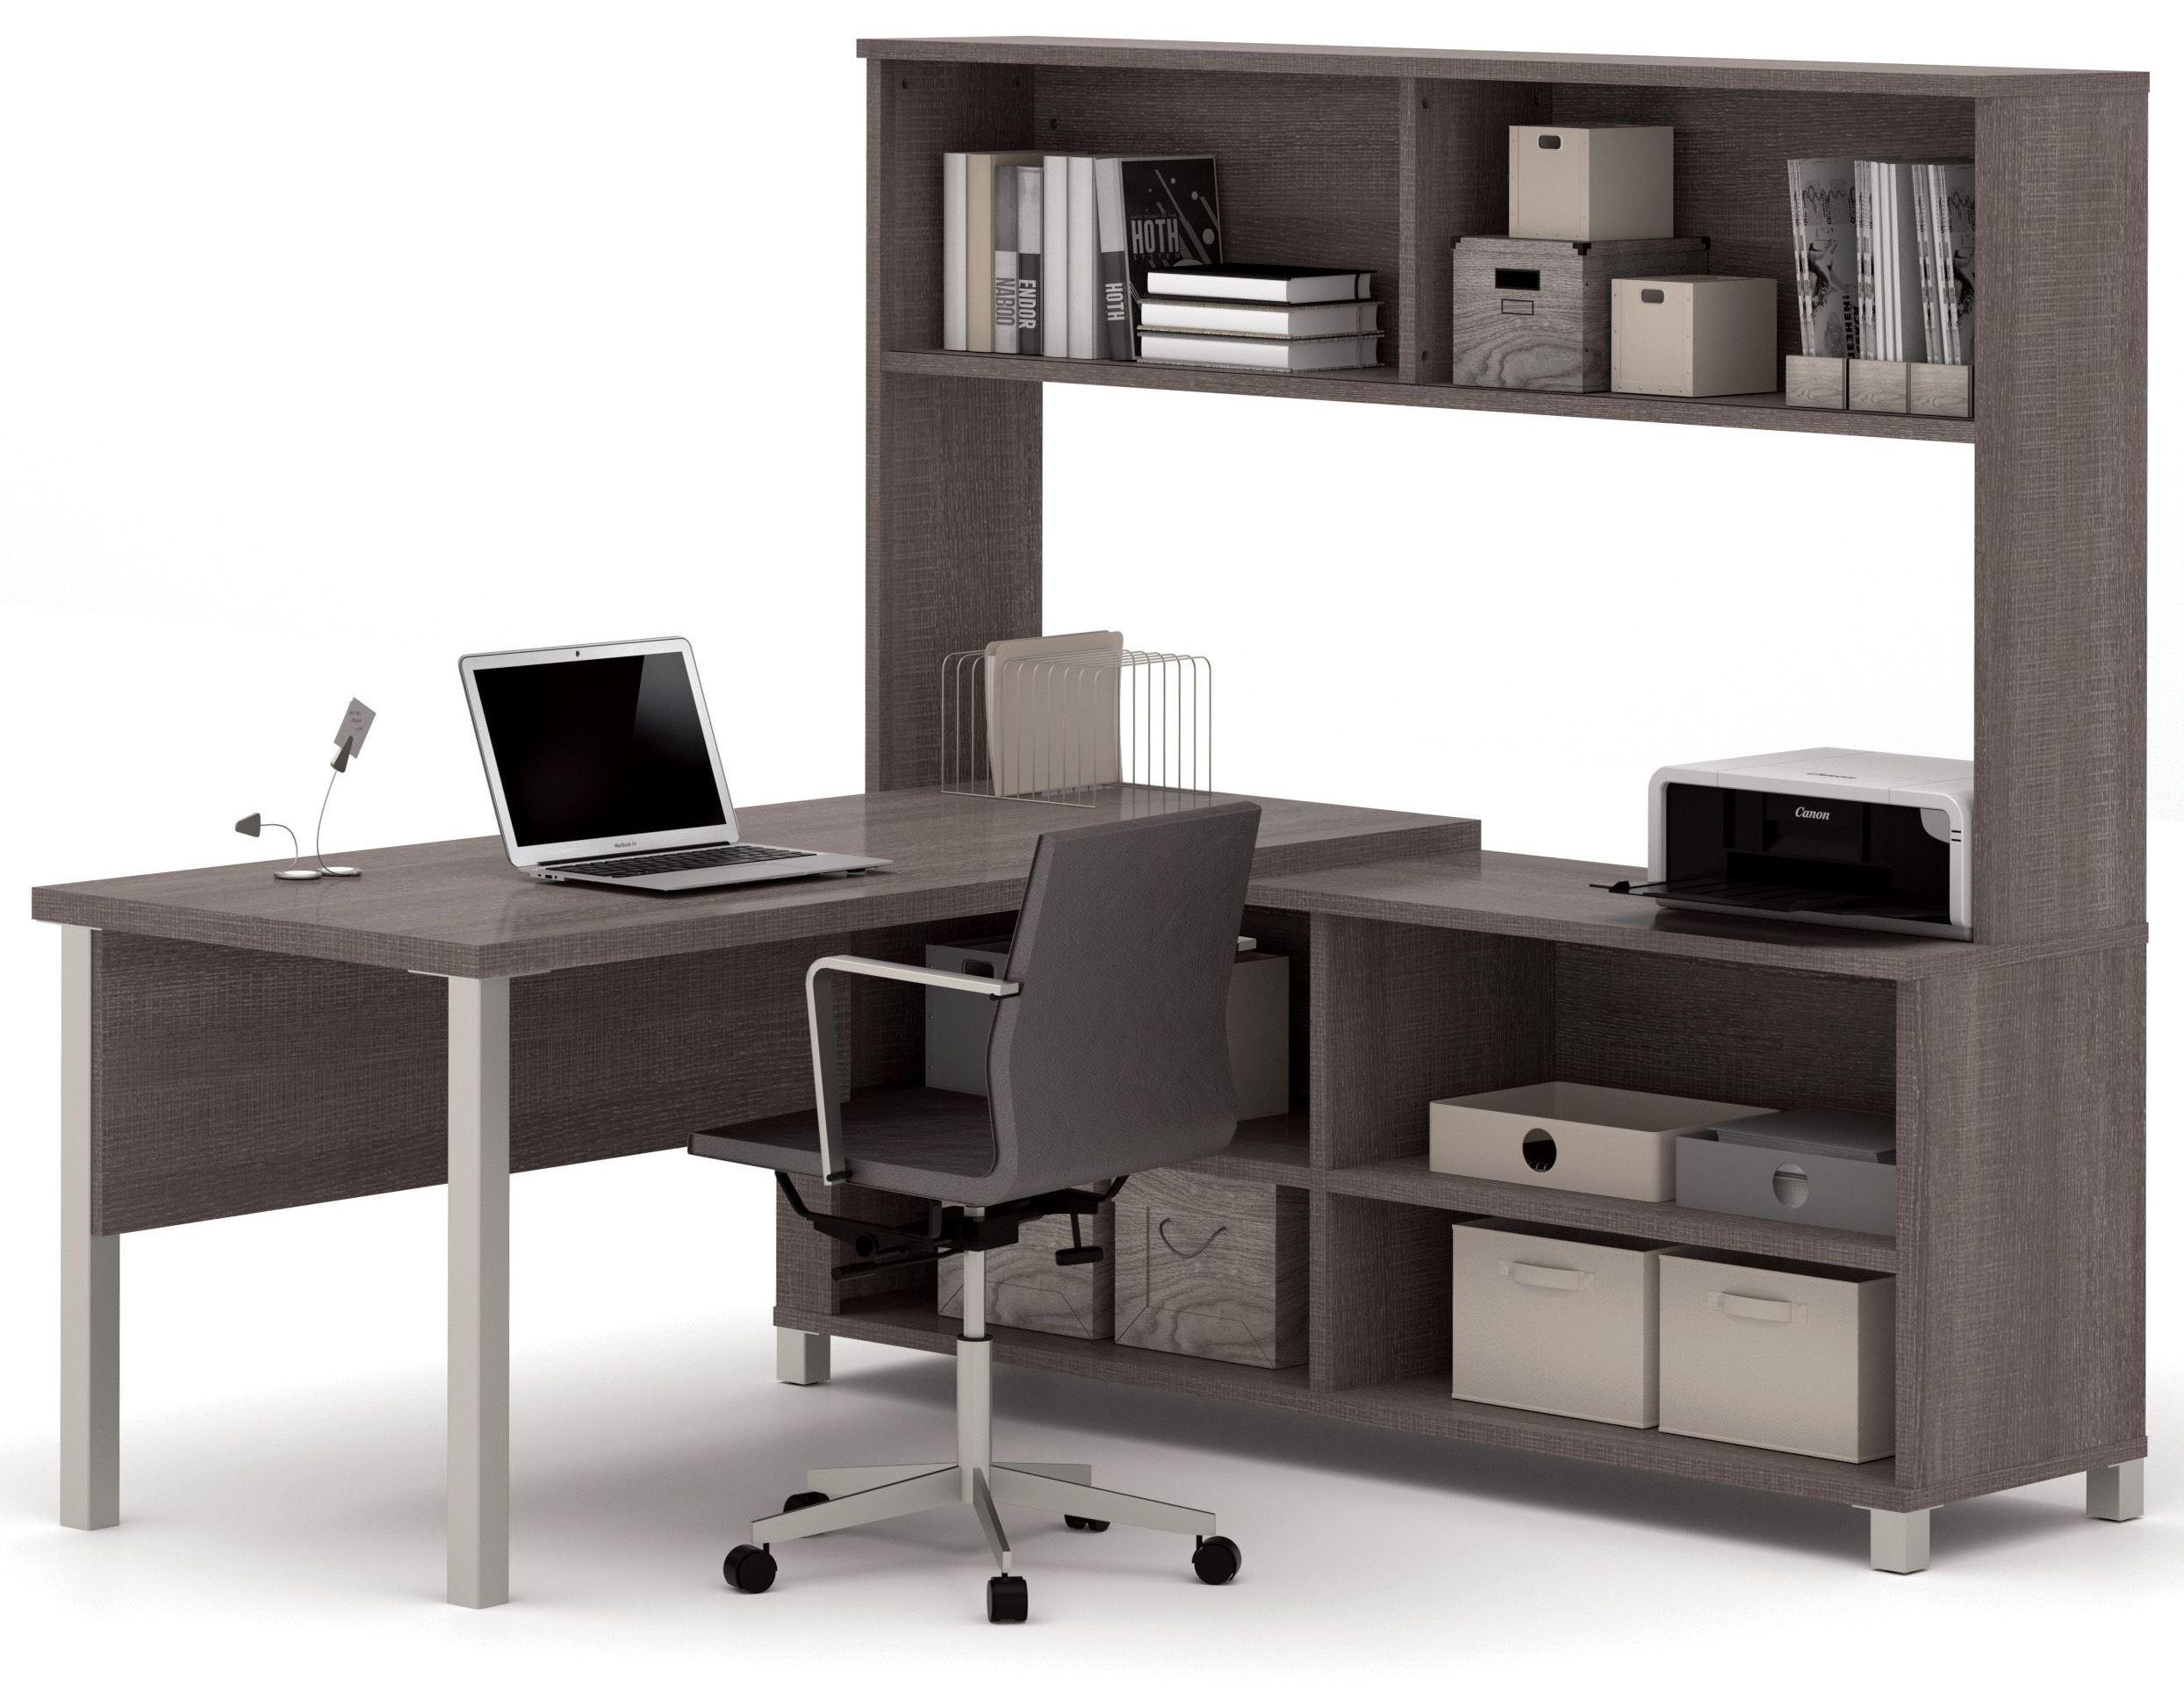 Pro Linea Bark Grey L Desk With Hutch From Bestar 120862